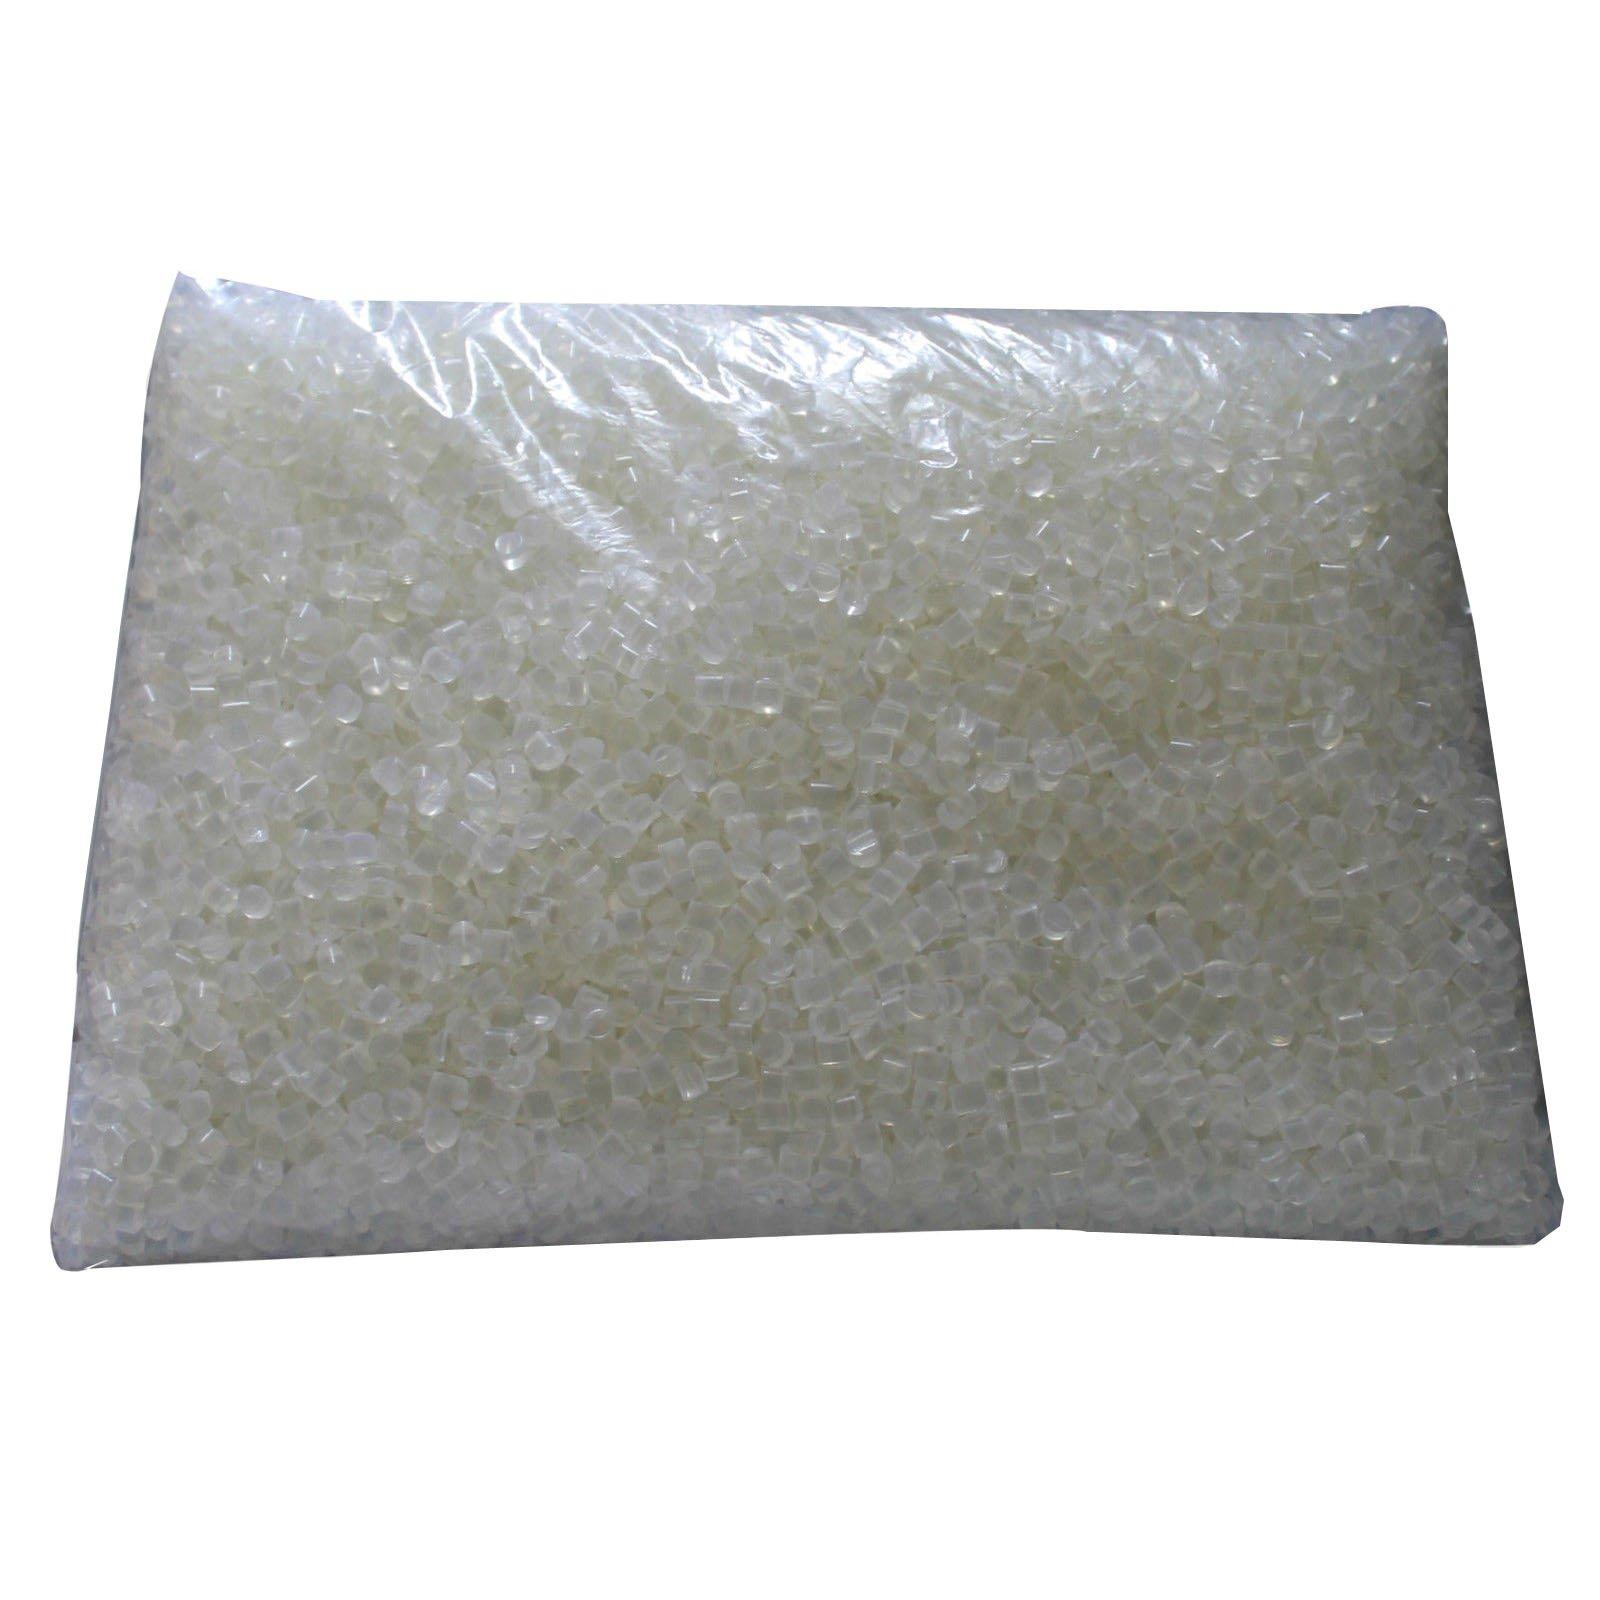 2.2Lb 1Kg Hot Melt Thermal Book Binding Glue Pellets Material Supplies Binder